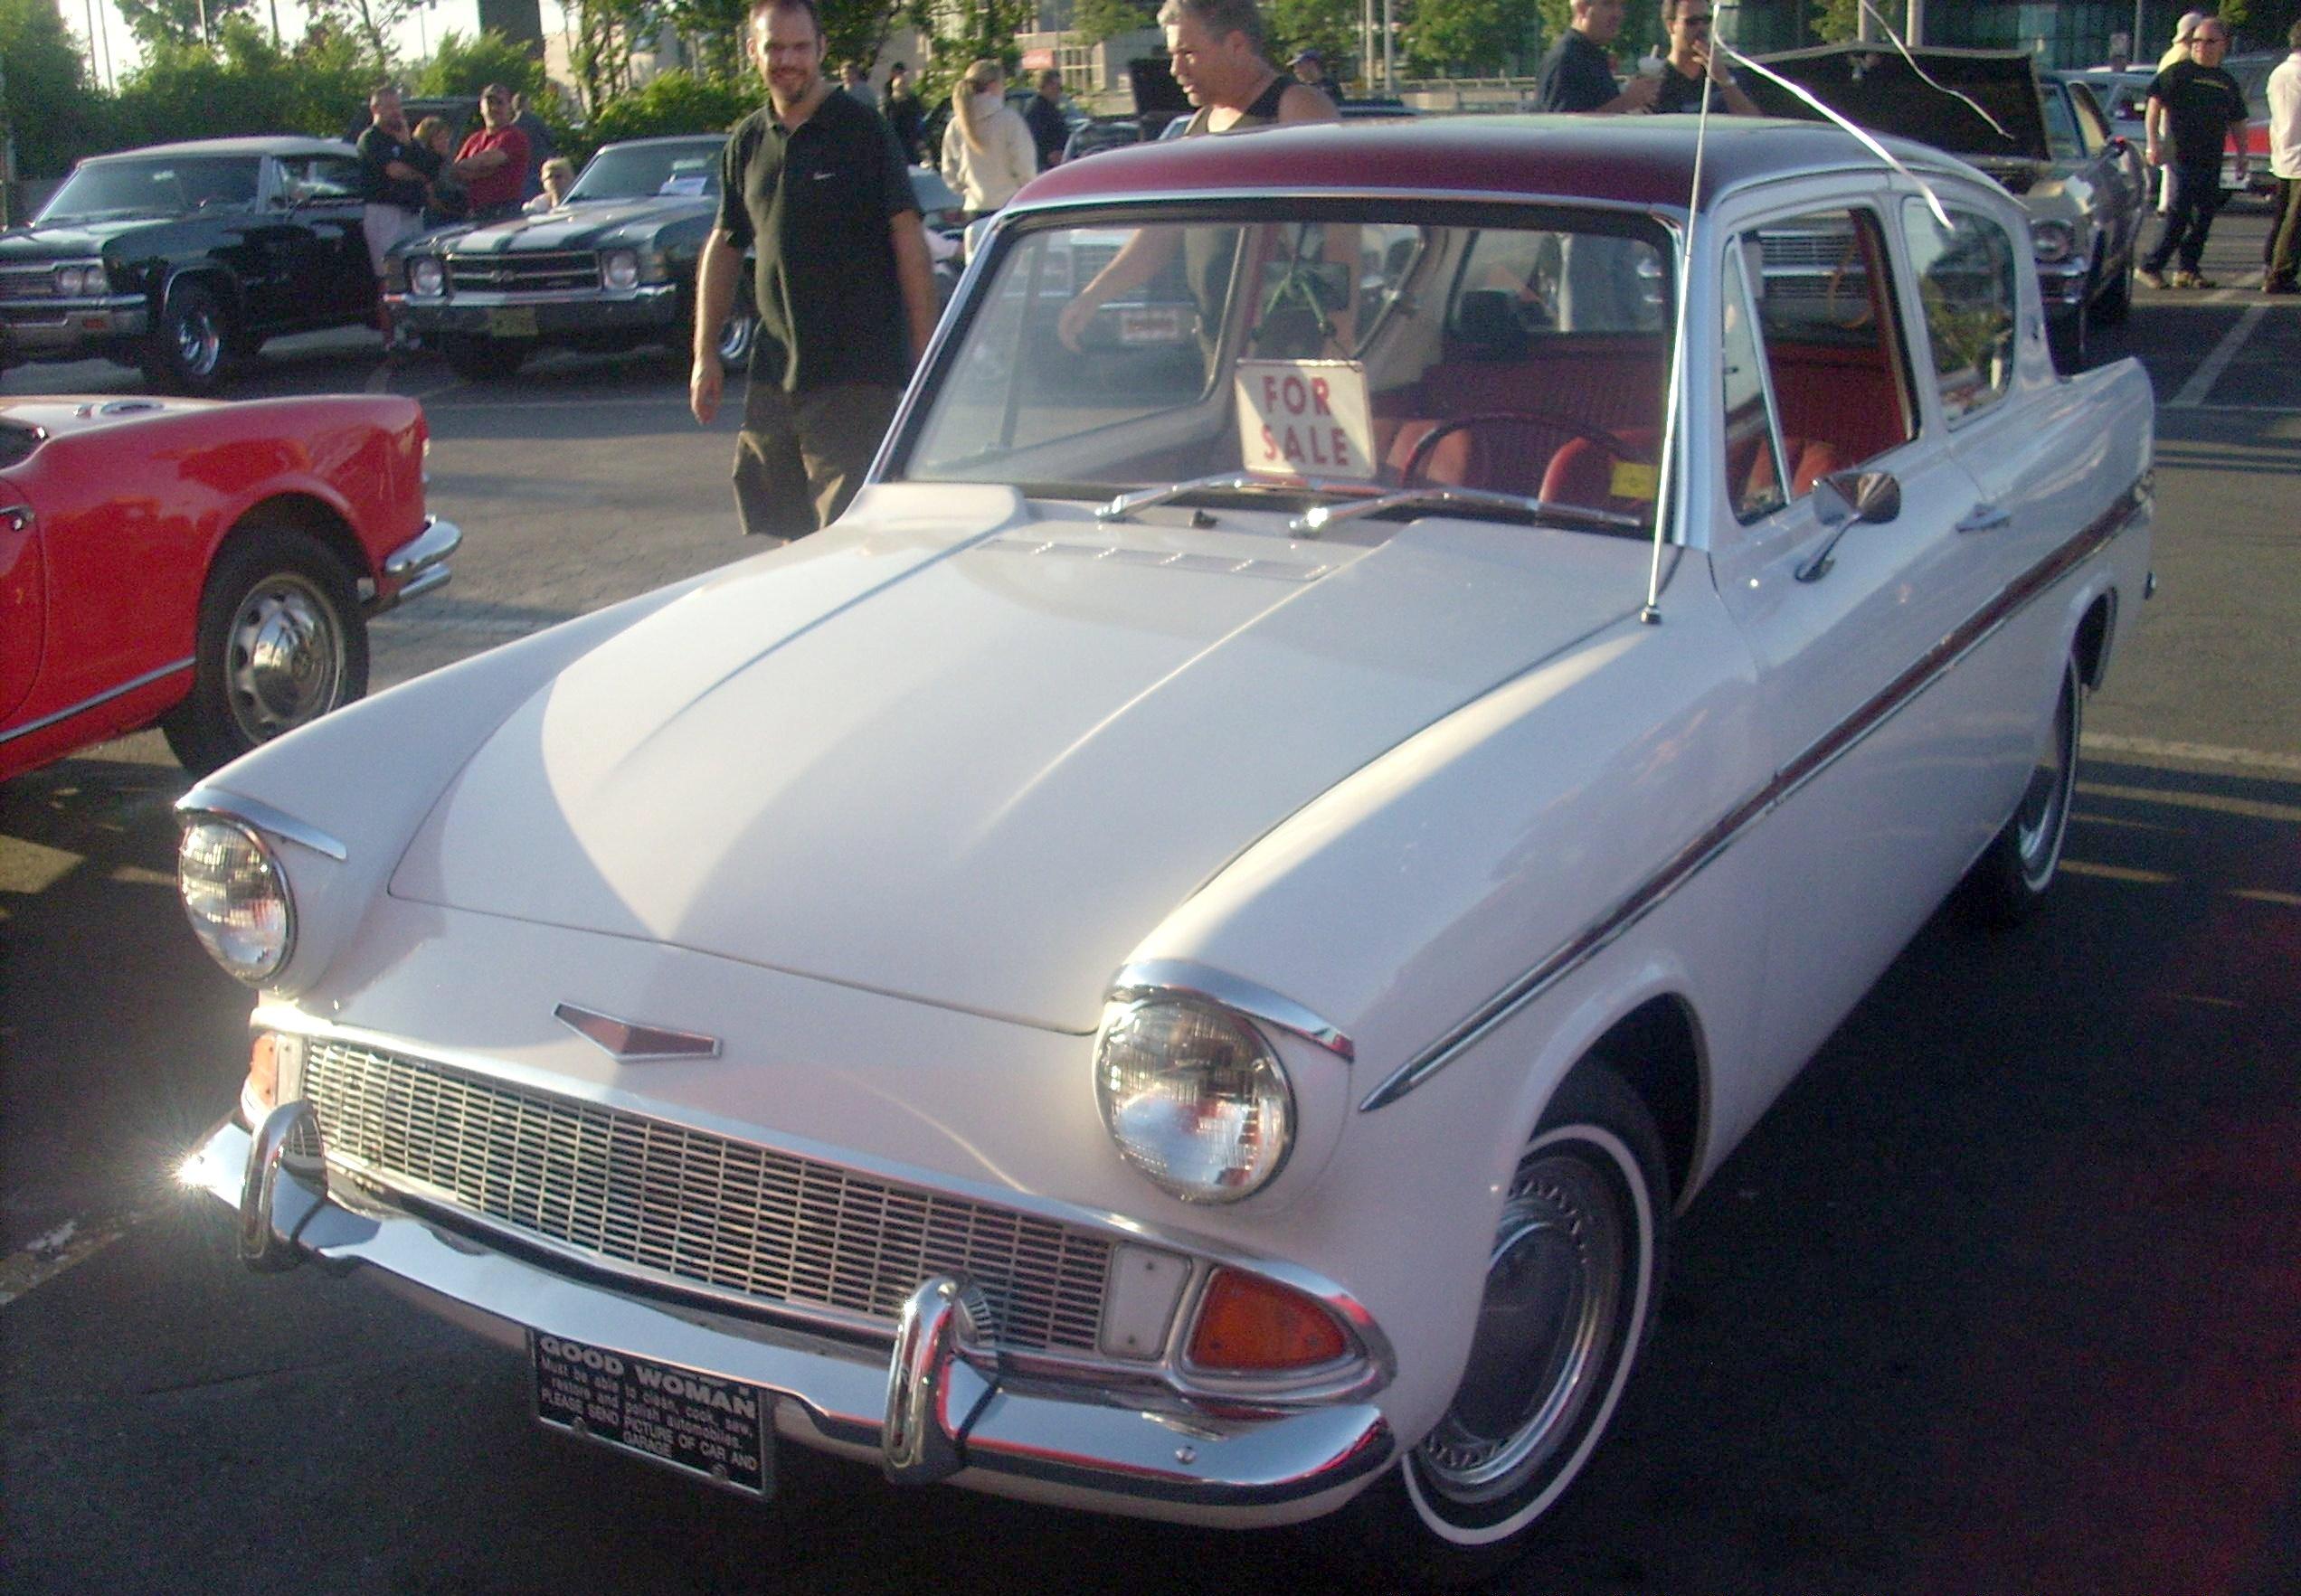 Old Ford cars - Random Photo (30971715) - Fanpop